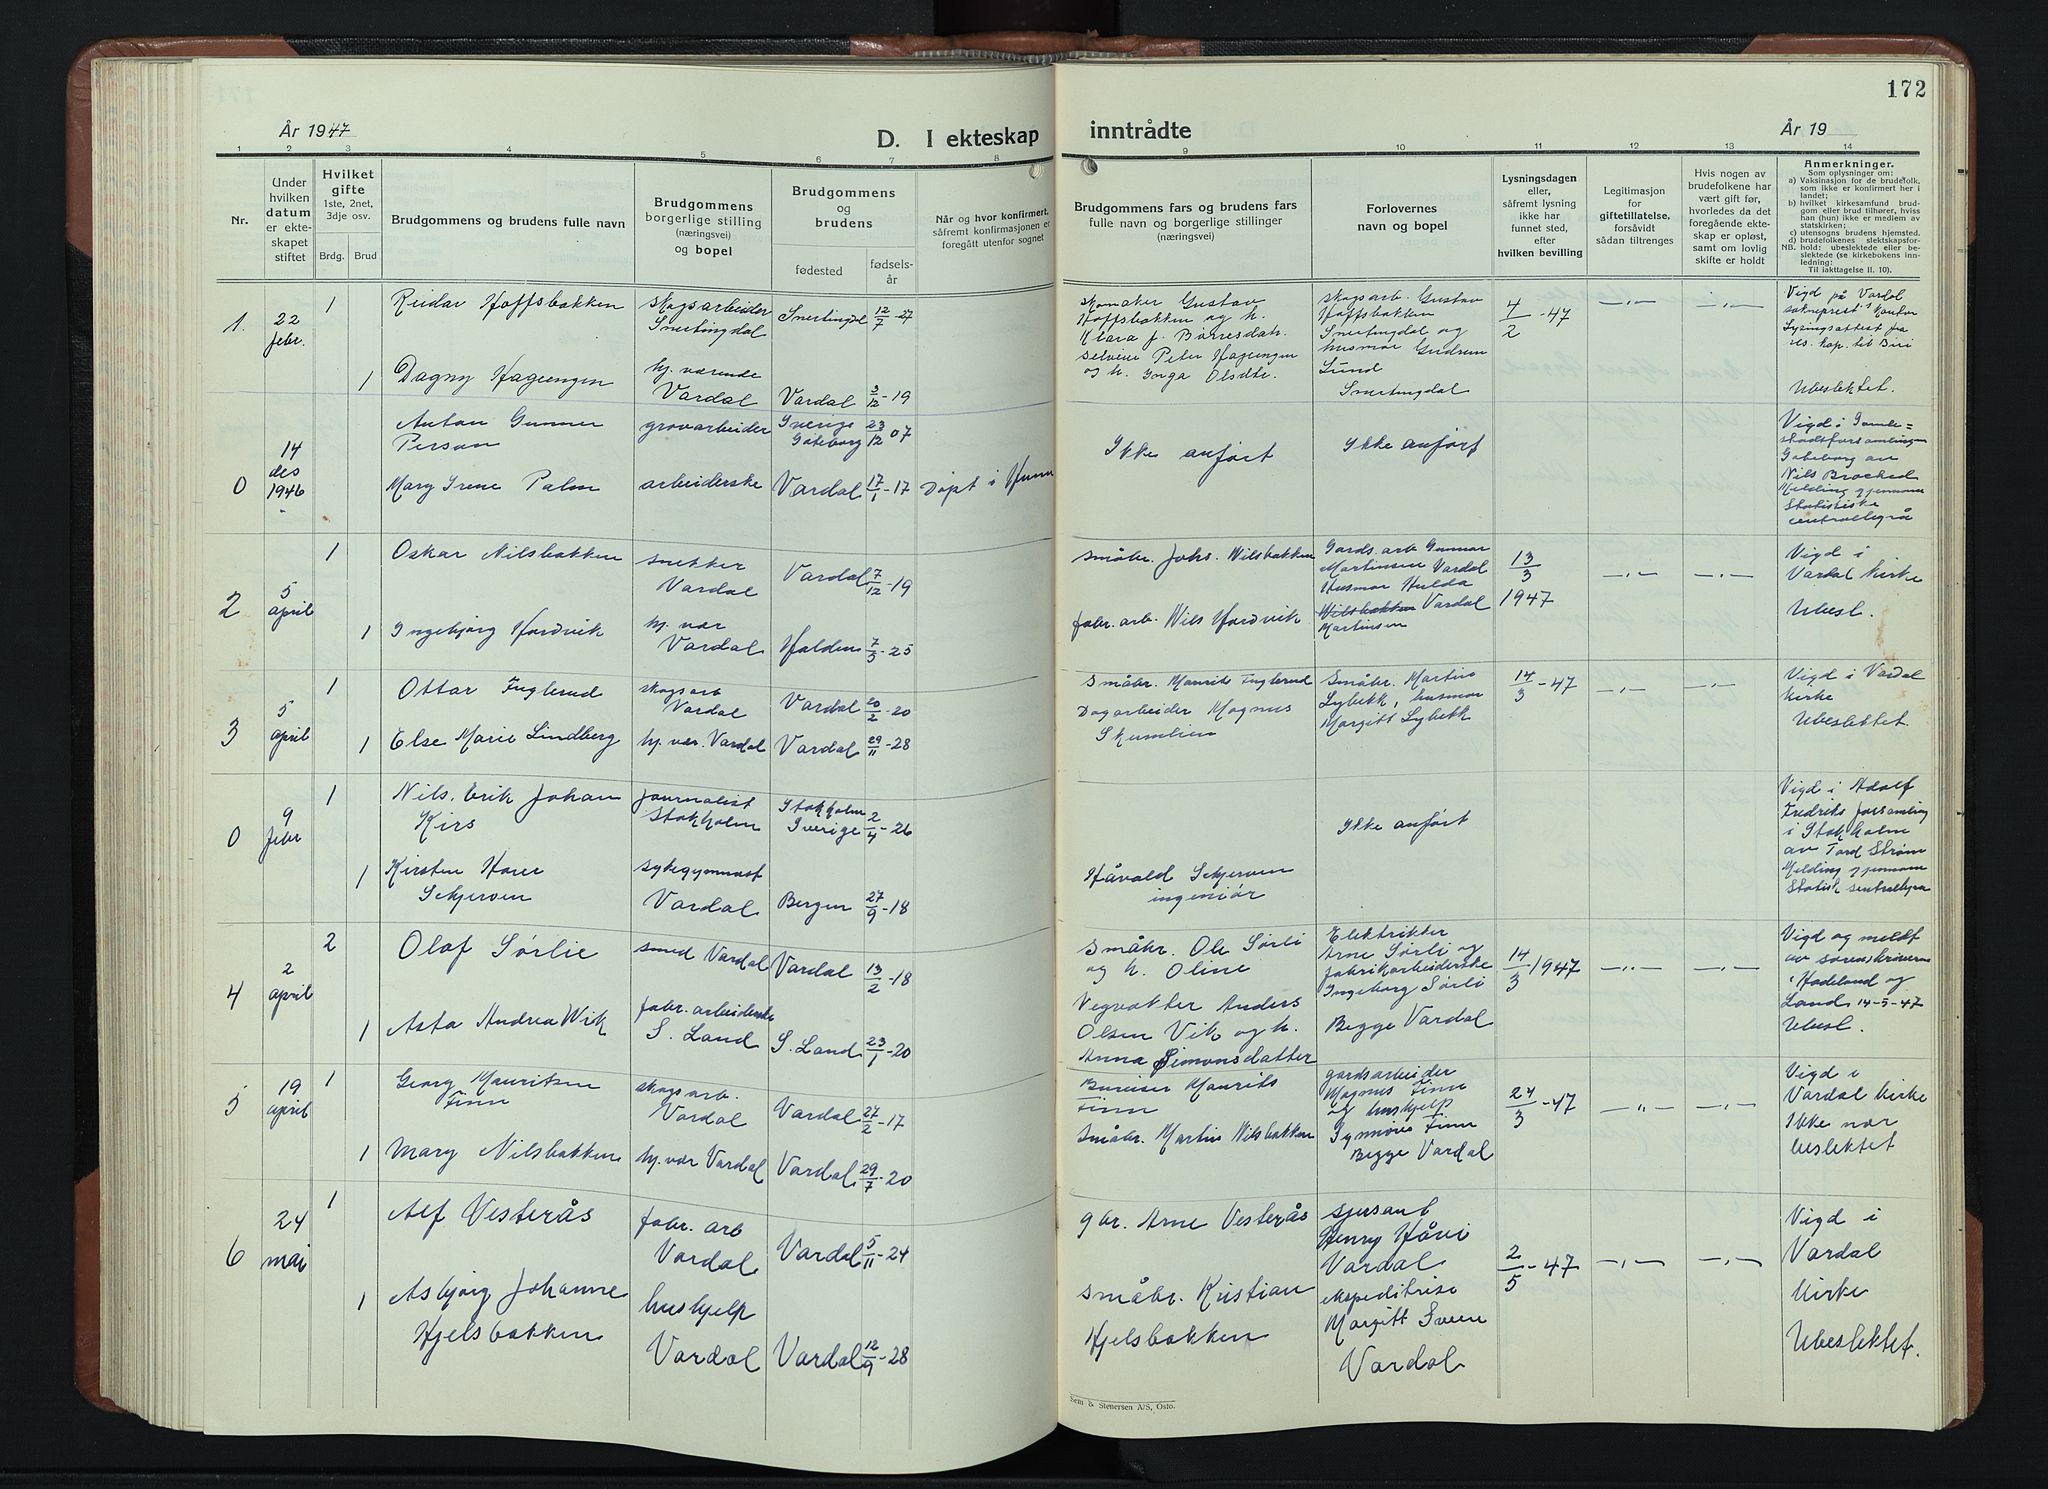 SAH, Vardal prestekontor, H/Ha/Hab/L0018: Klokkerbok nr. 18, 1931-1951, s. 172